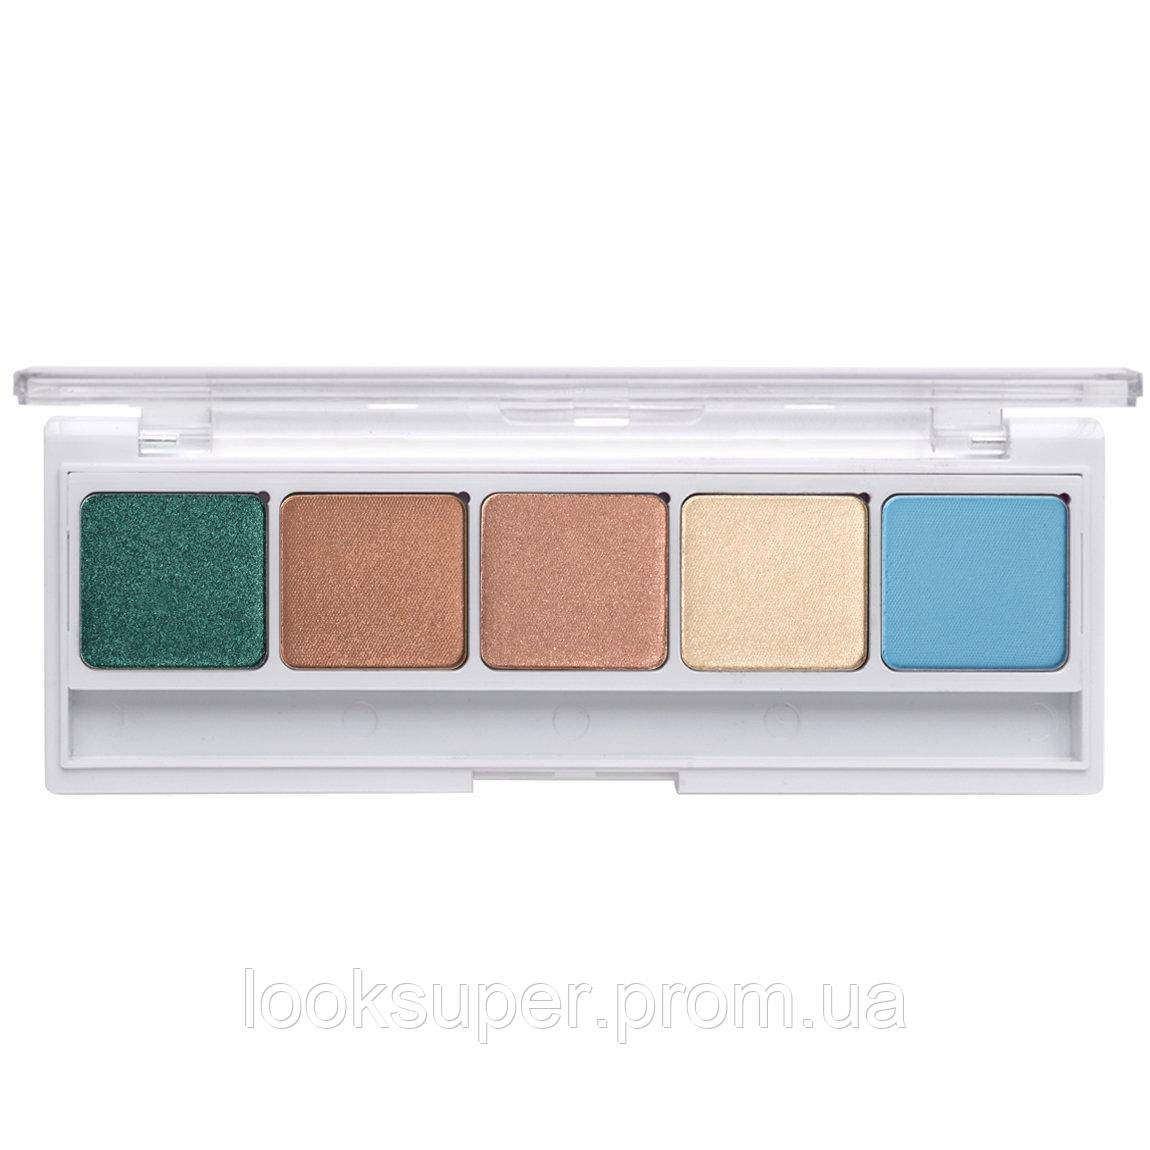 Палитра теней для век NATASHA DENONA Eyeshadow Palette 5  palette 06